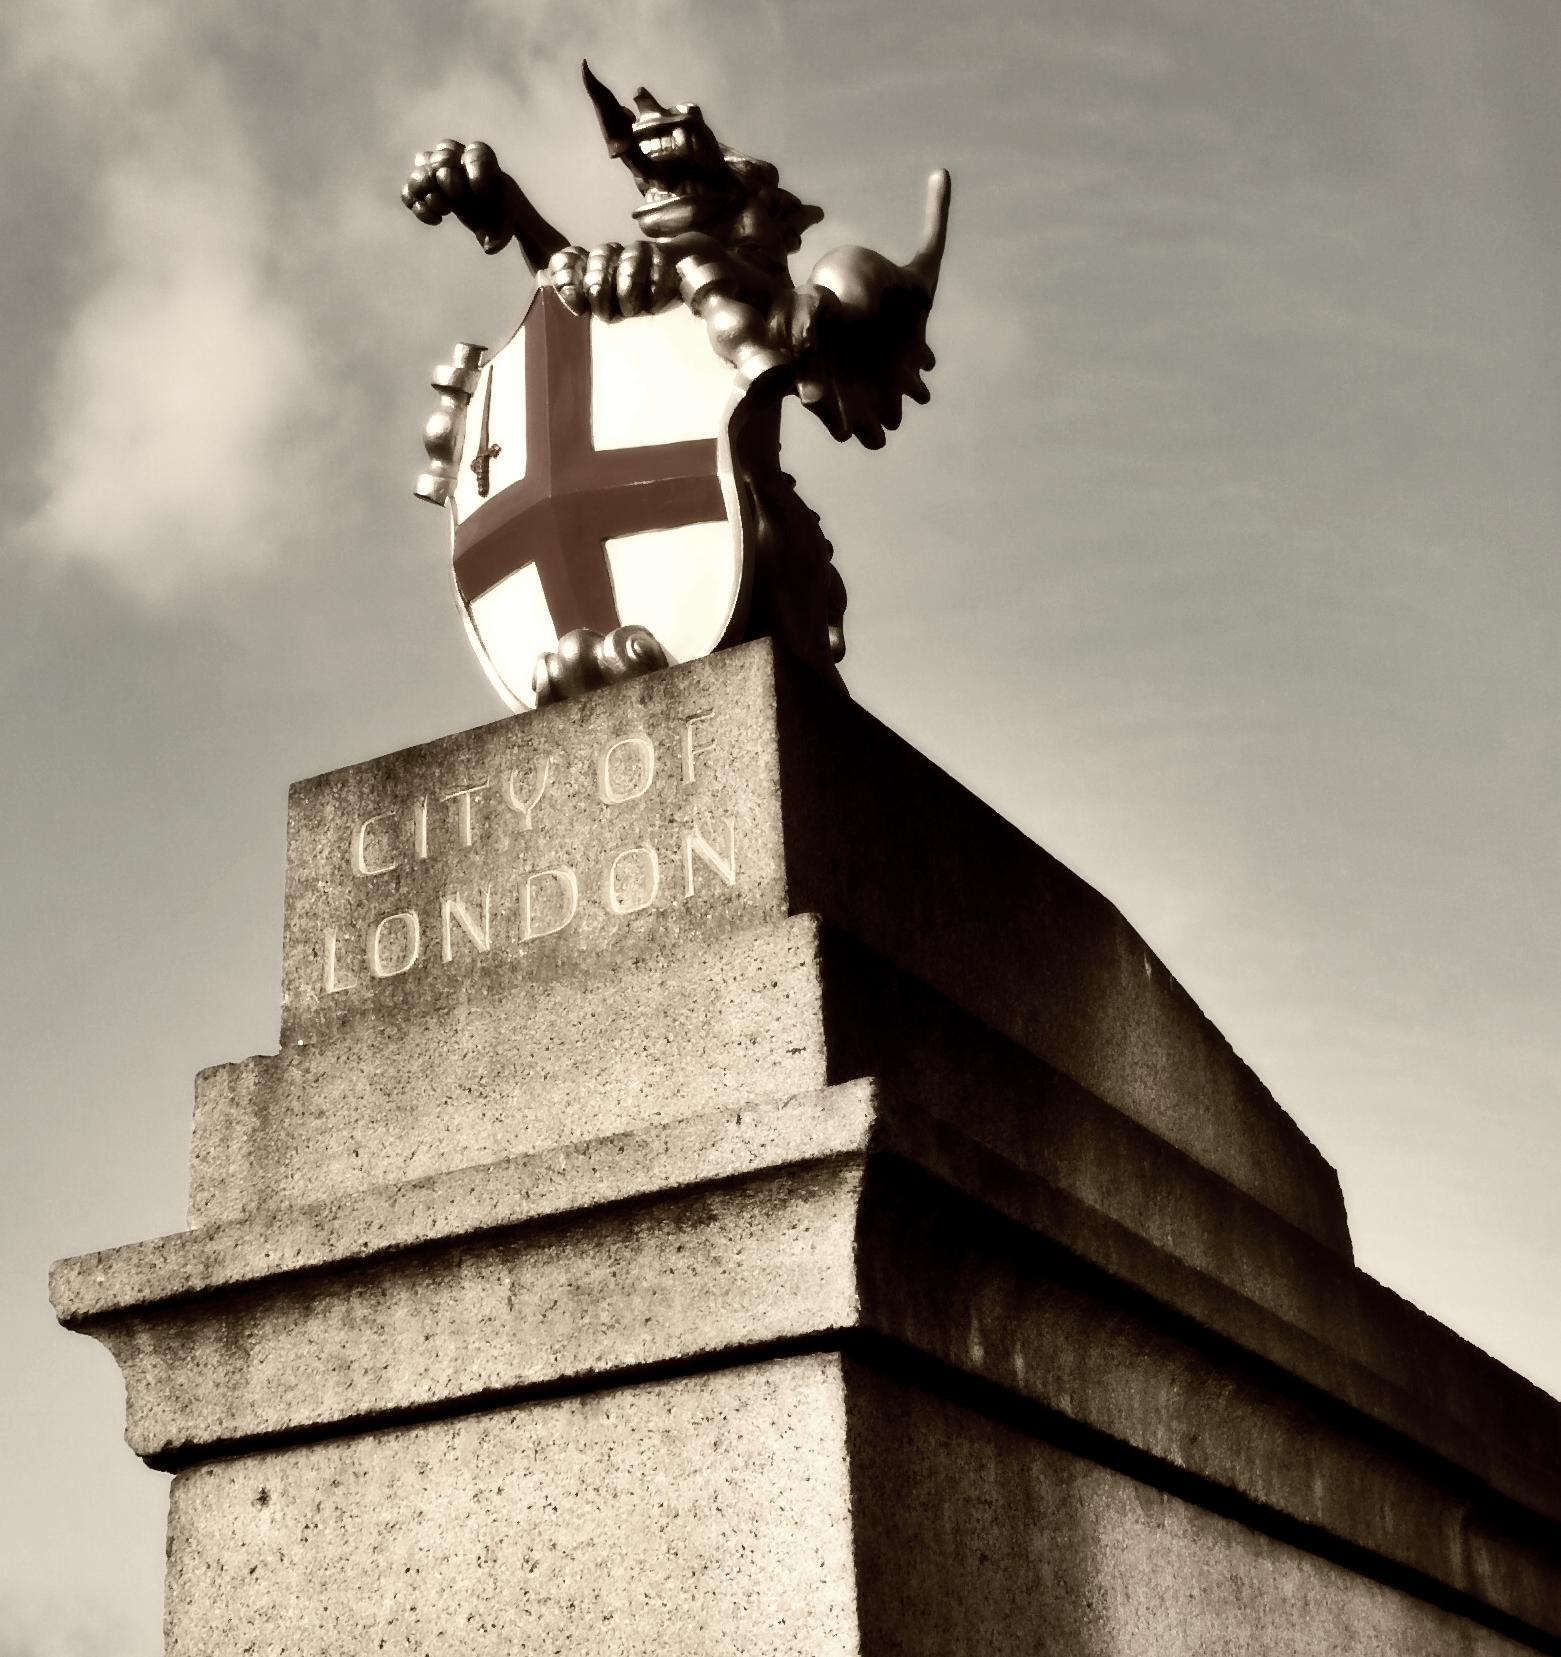 Dragon boundary mark, south side of London Bridge